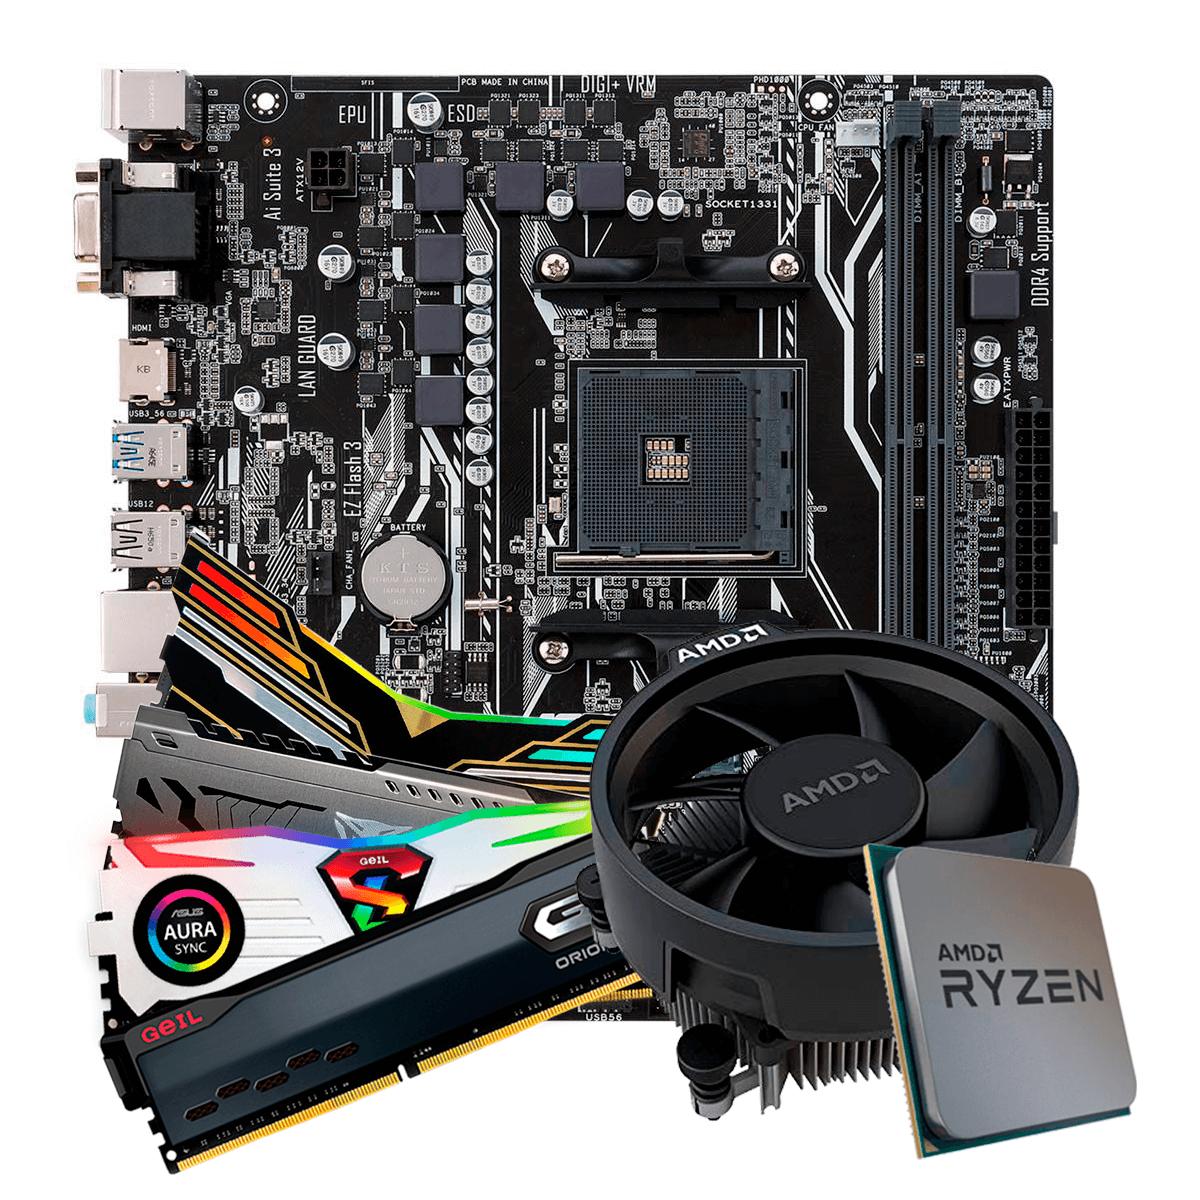 Kit Upgrade, AMD Ryzen 5 3500, Asus Prime A320M-K, Memória DDR4 8GB 3000MHz